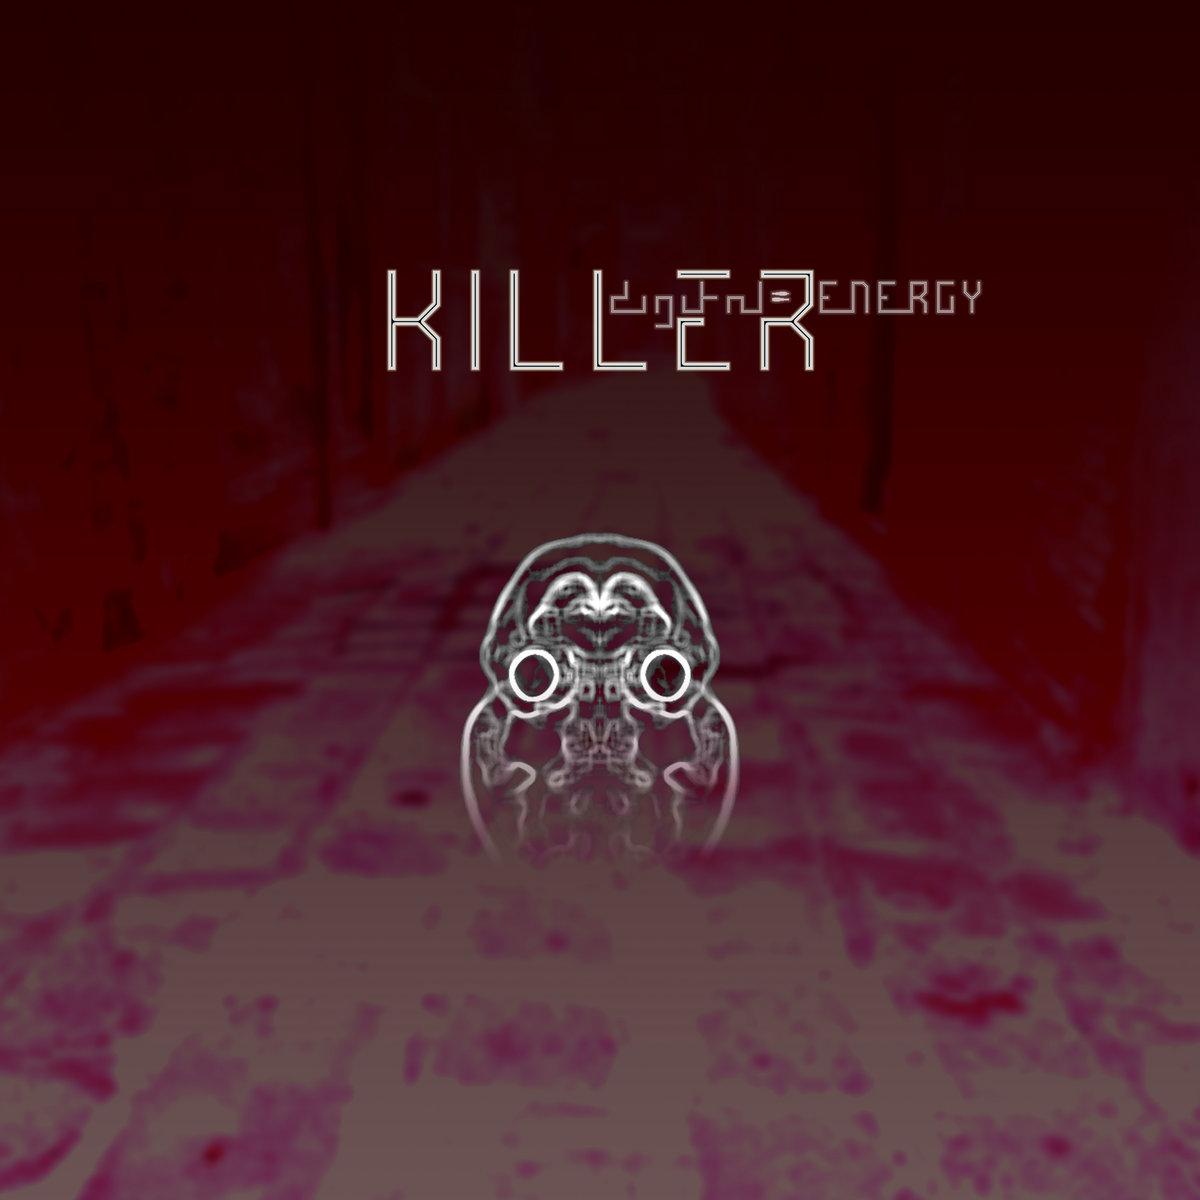 digital ENERGY - Killer - digital ENERGY - Killer